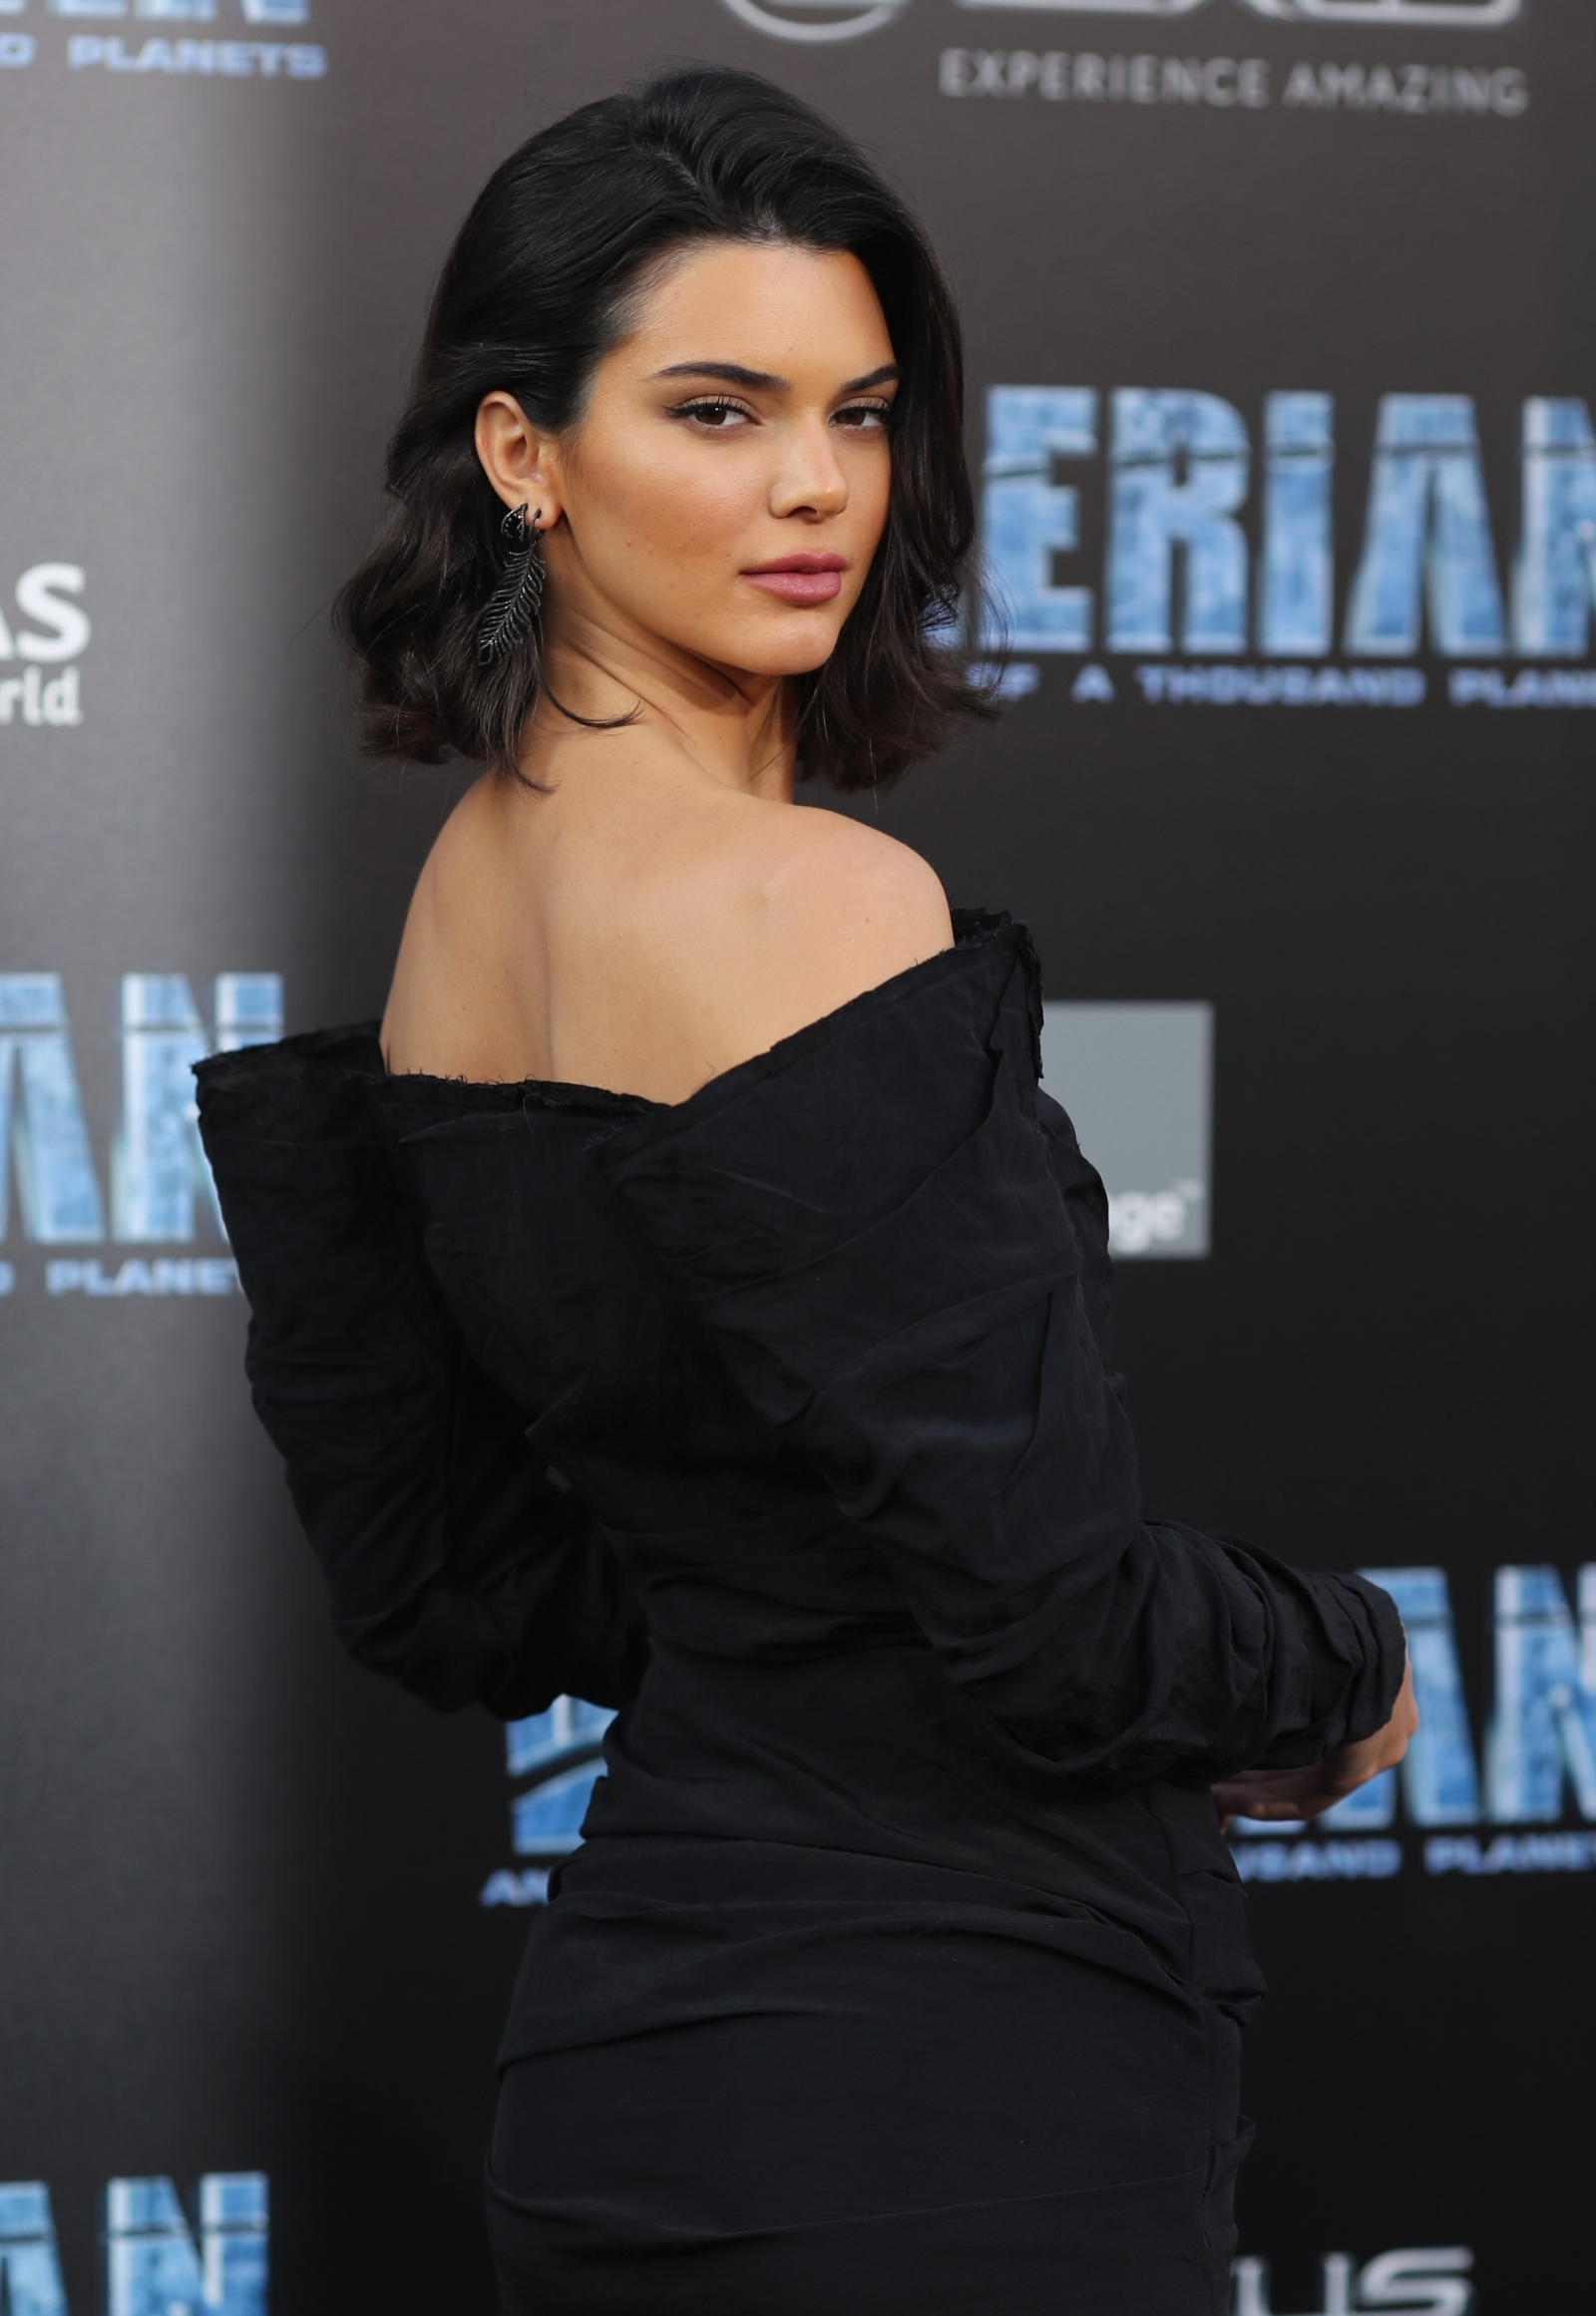 Kendall Jenner Bob Frisuren für 2018